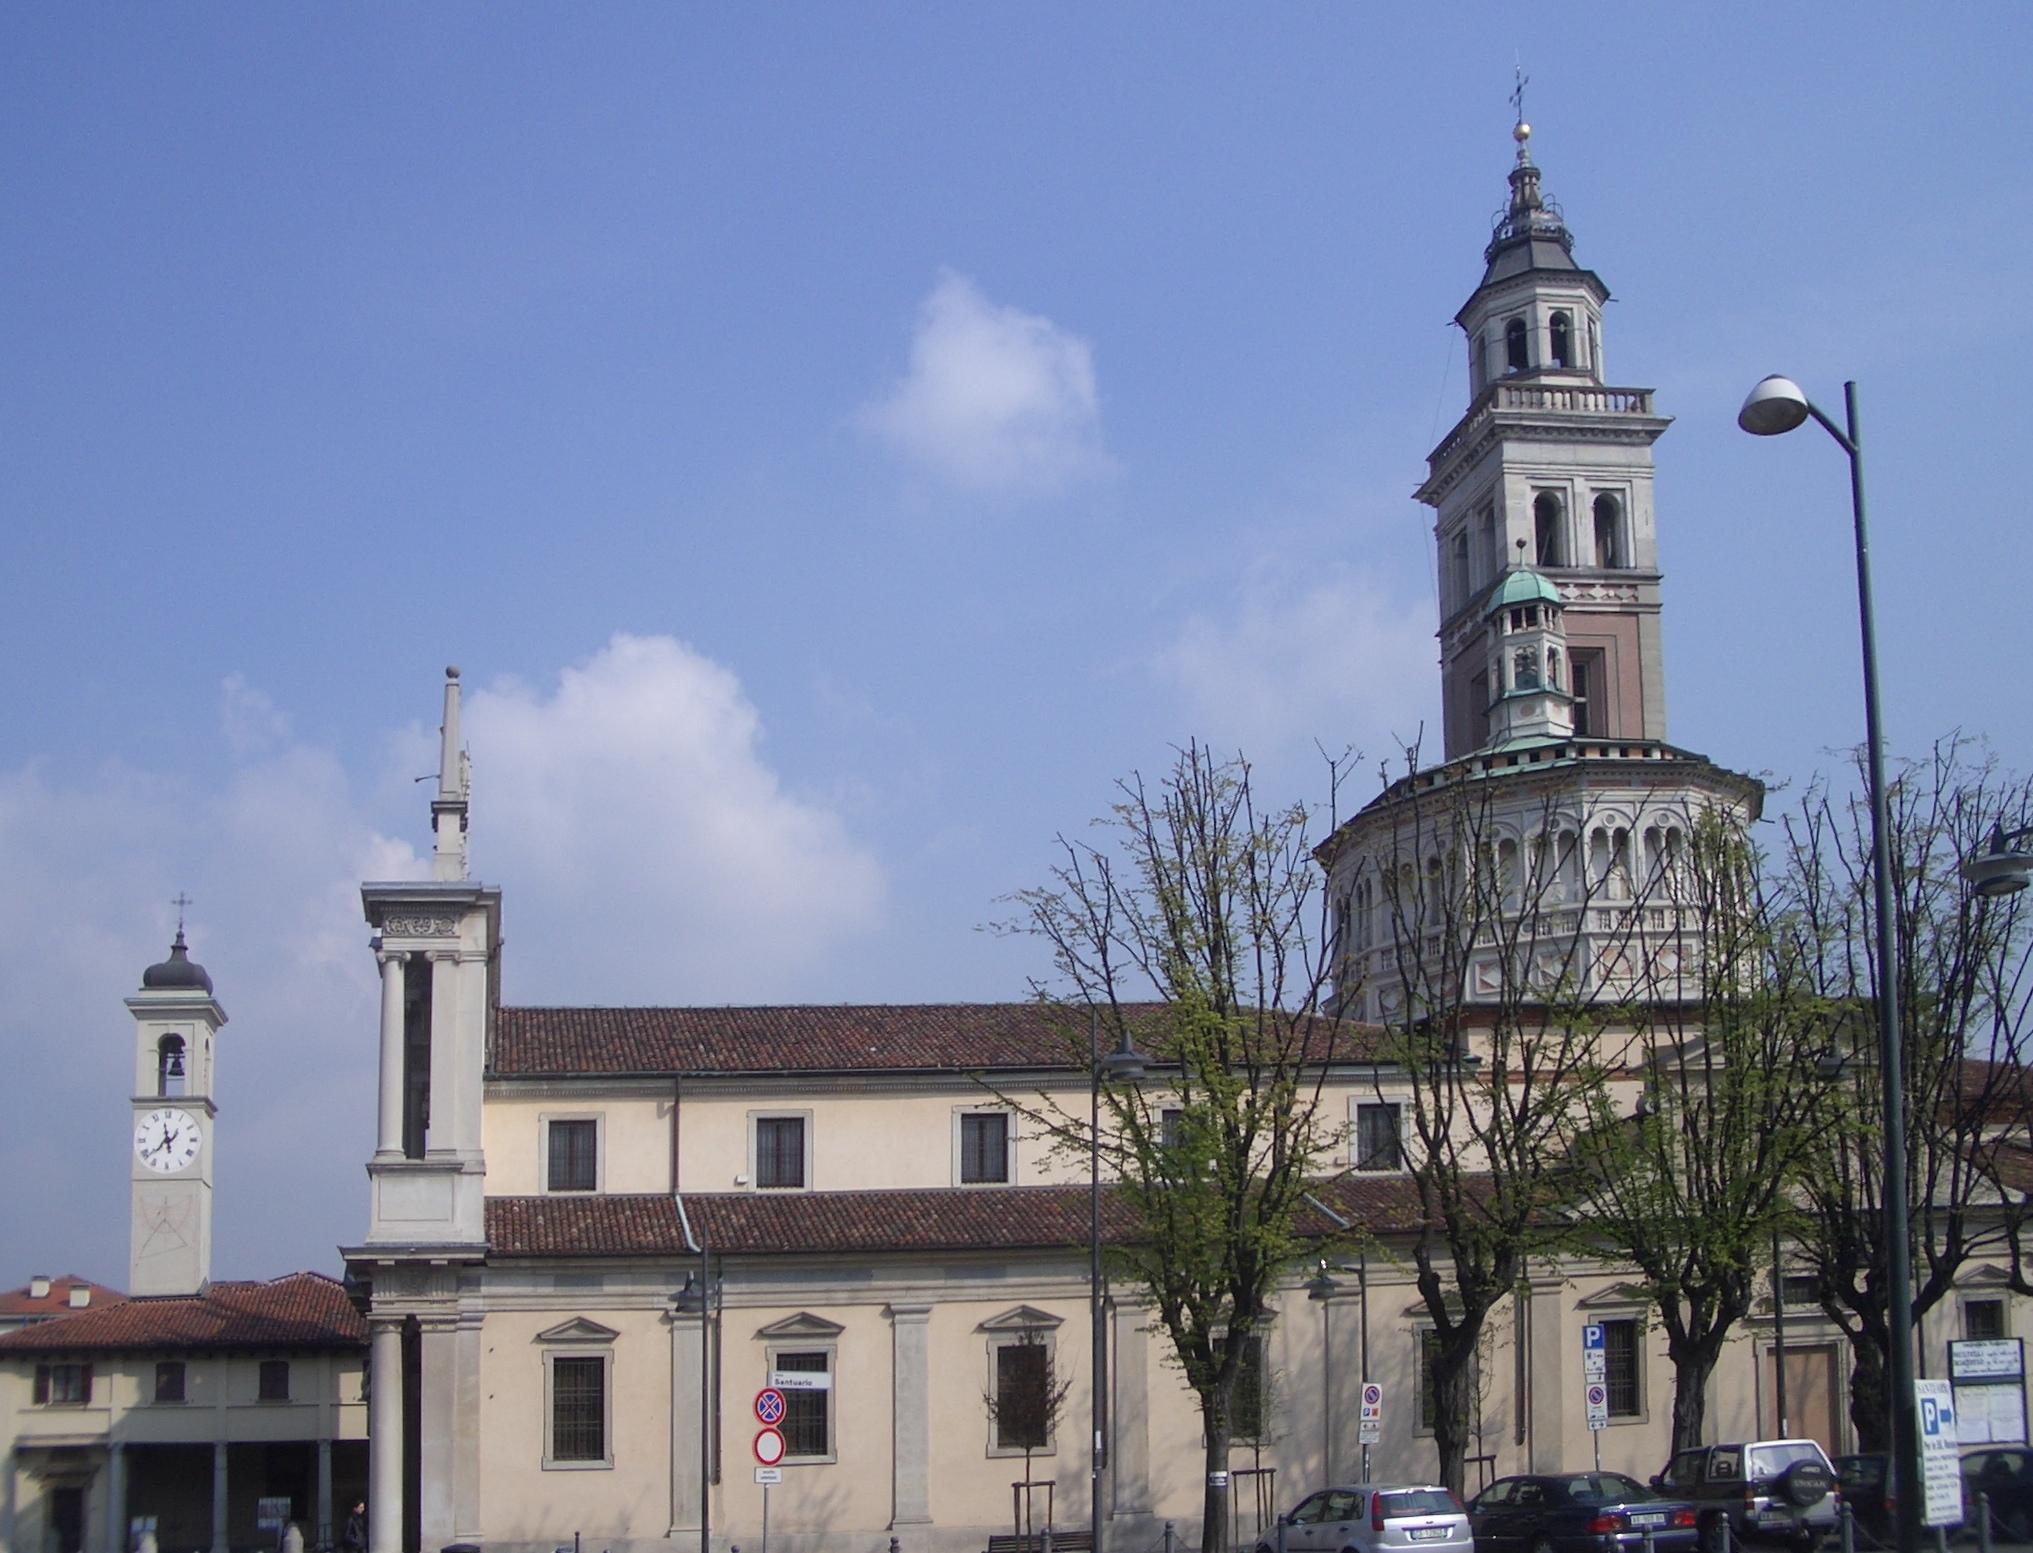 Saronno Italy  City pictures : Santuario Saronno 01 Wikimedia Commons